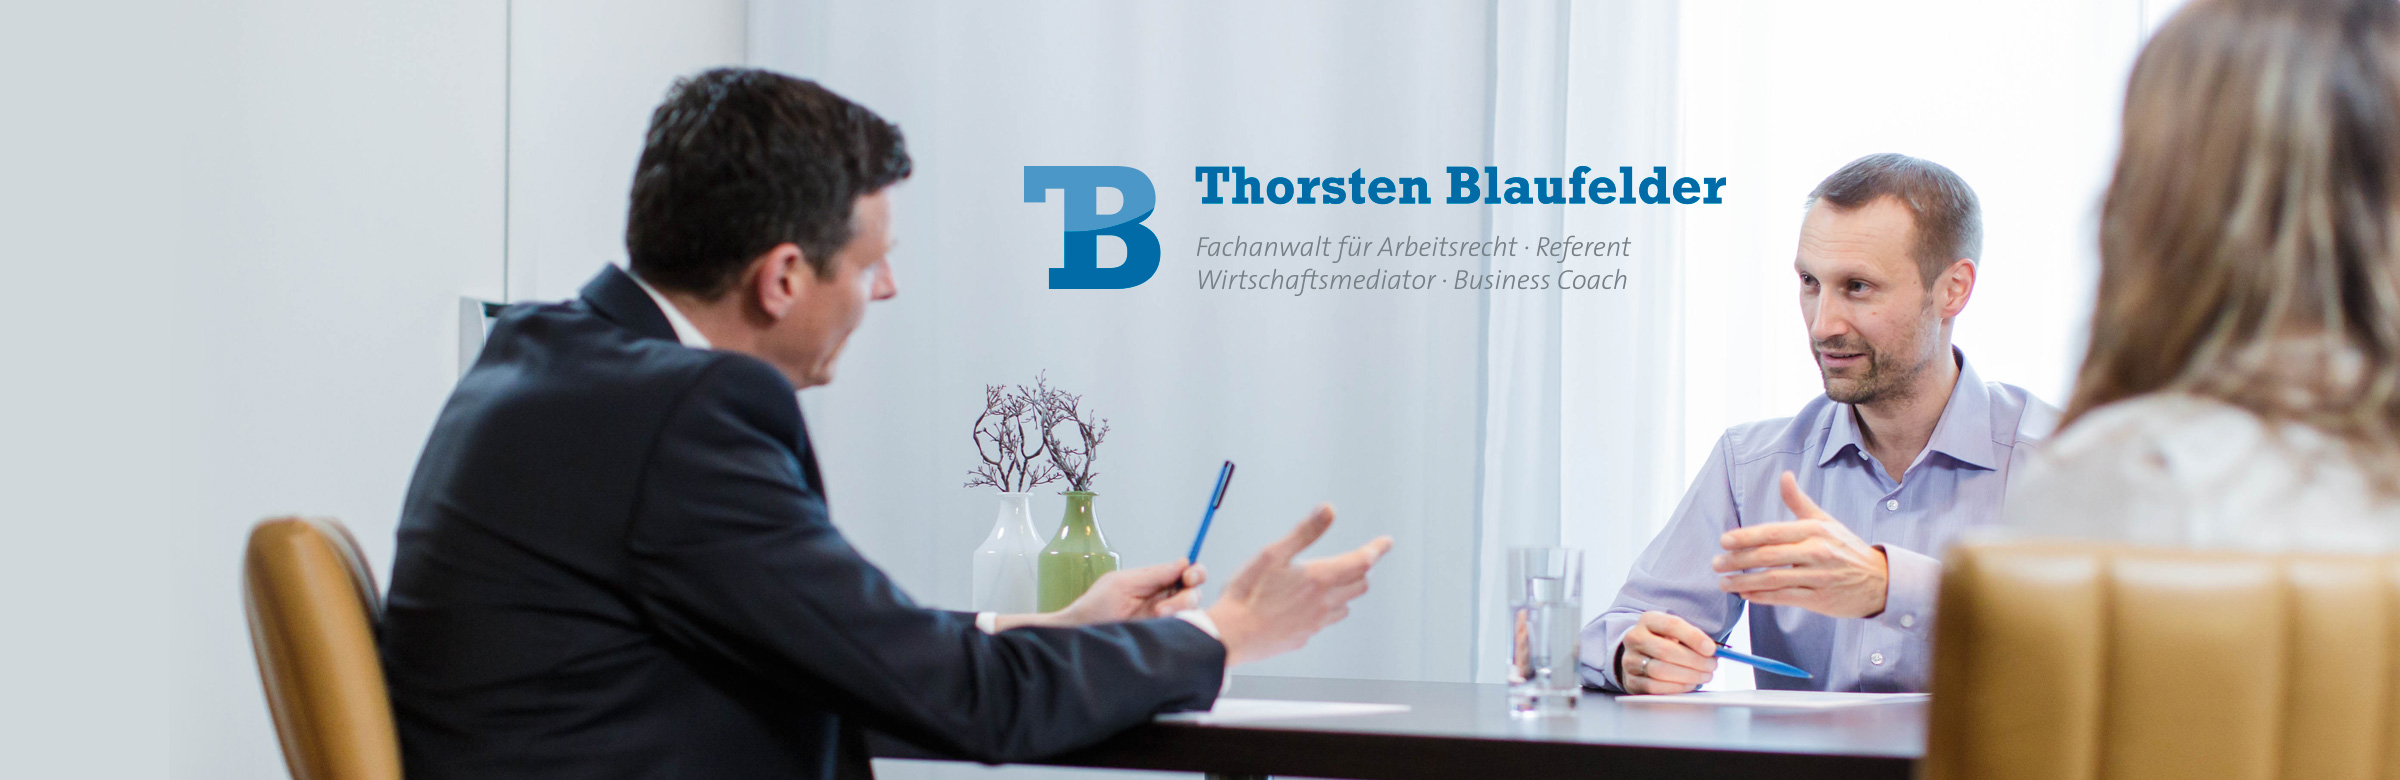 Glas Konflikt Eskalationsstufen Mediation Blaufelder